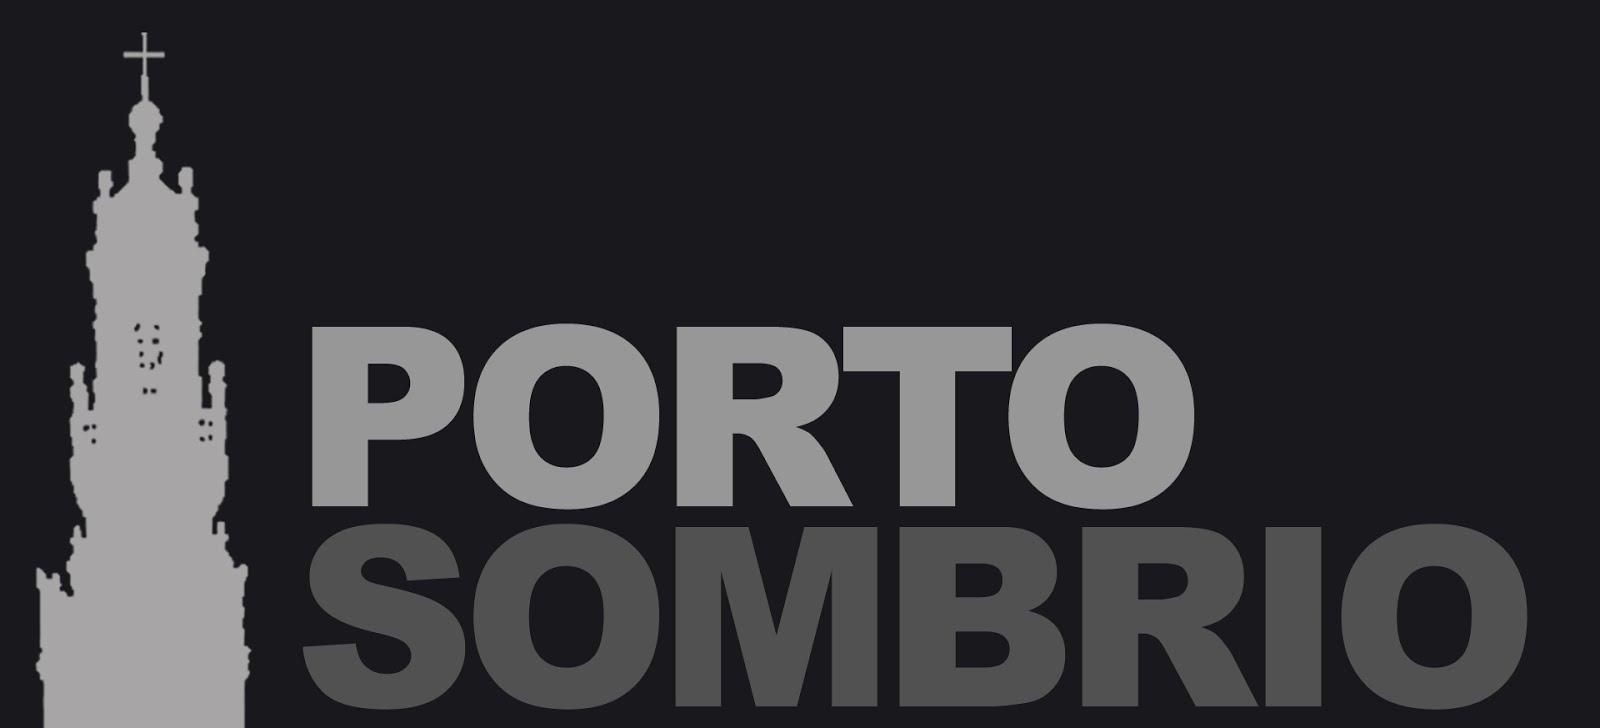 Porto Sombrio